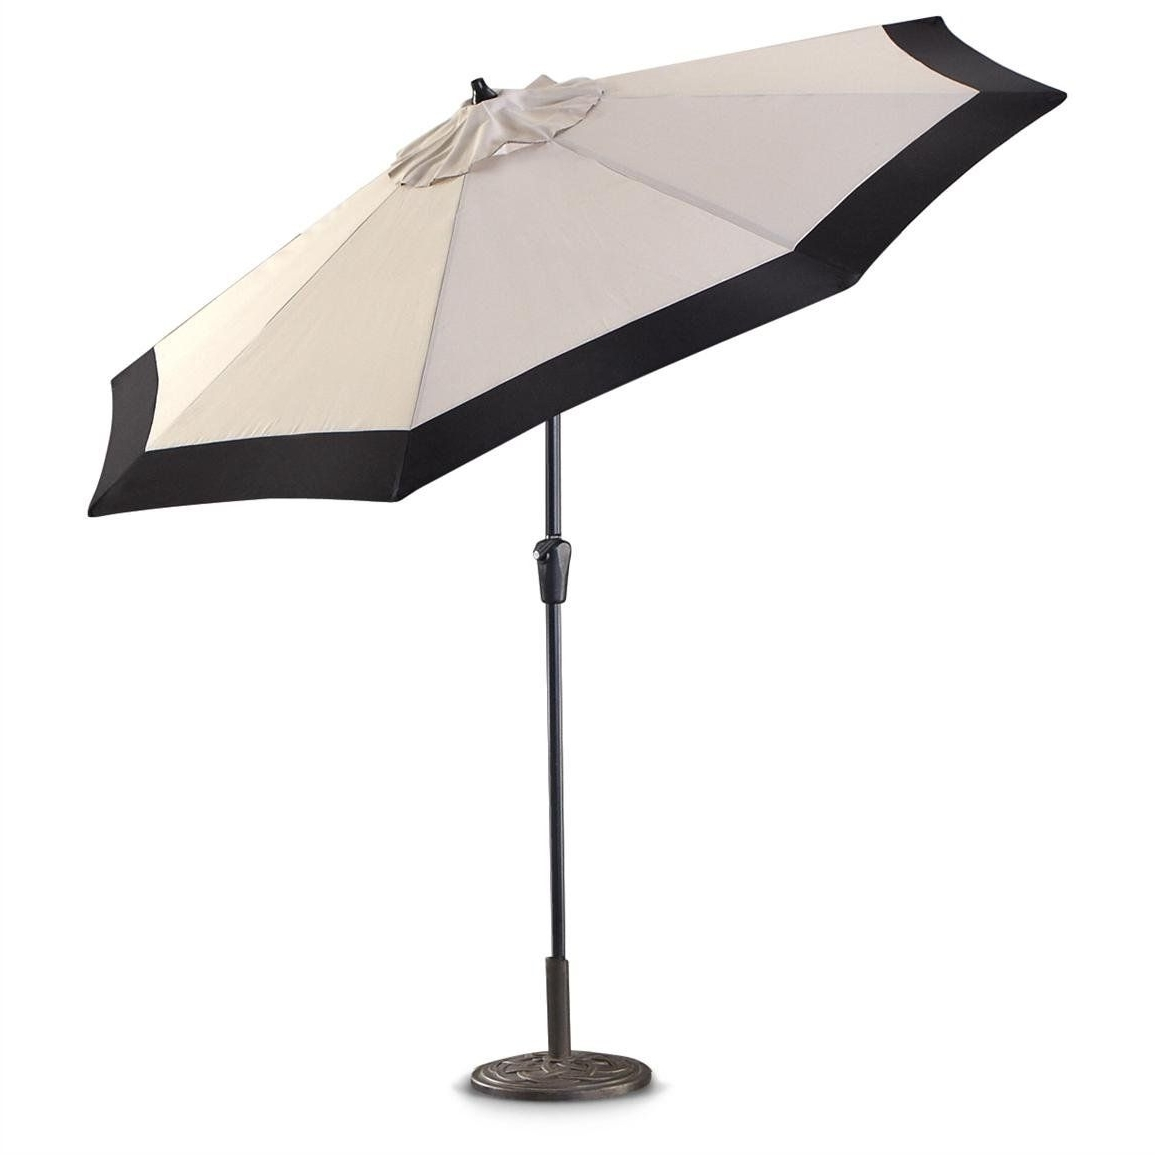 Popular White Patio Umbrellas #5: Castlecreek 9 Two Tone Deluxe Market Patio Regarding Black And White Patio Umbrellas (View 17 of 20)